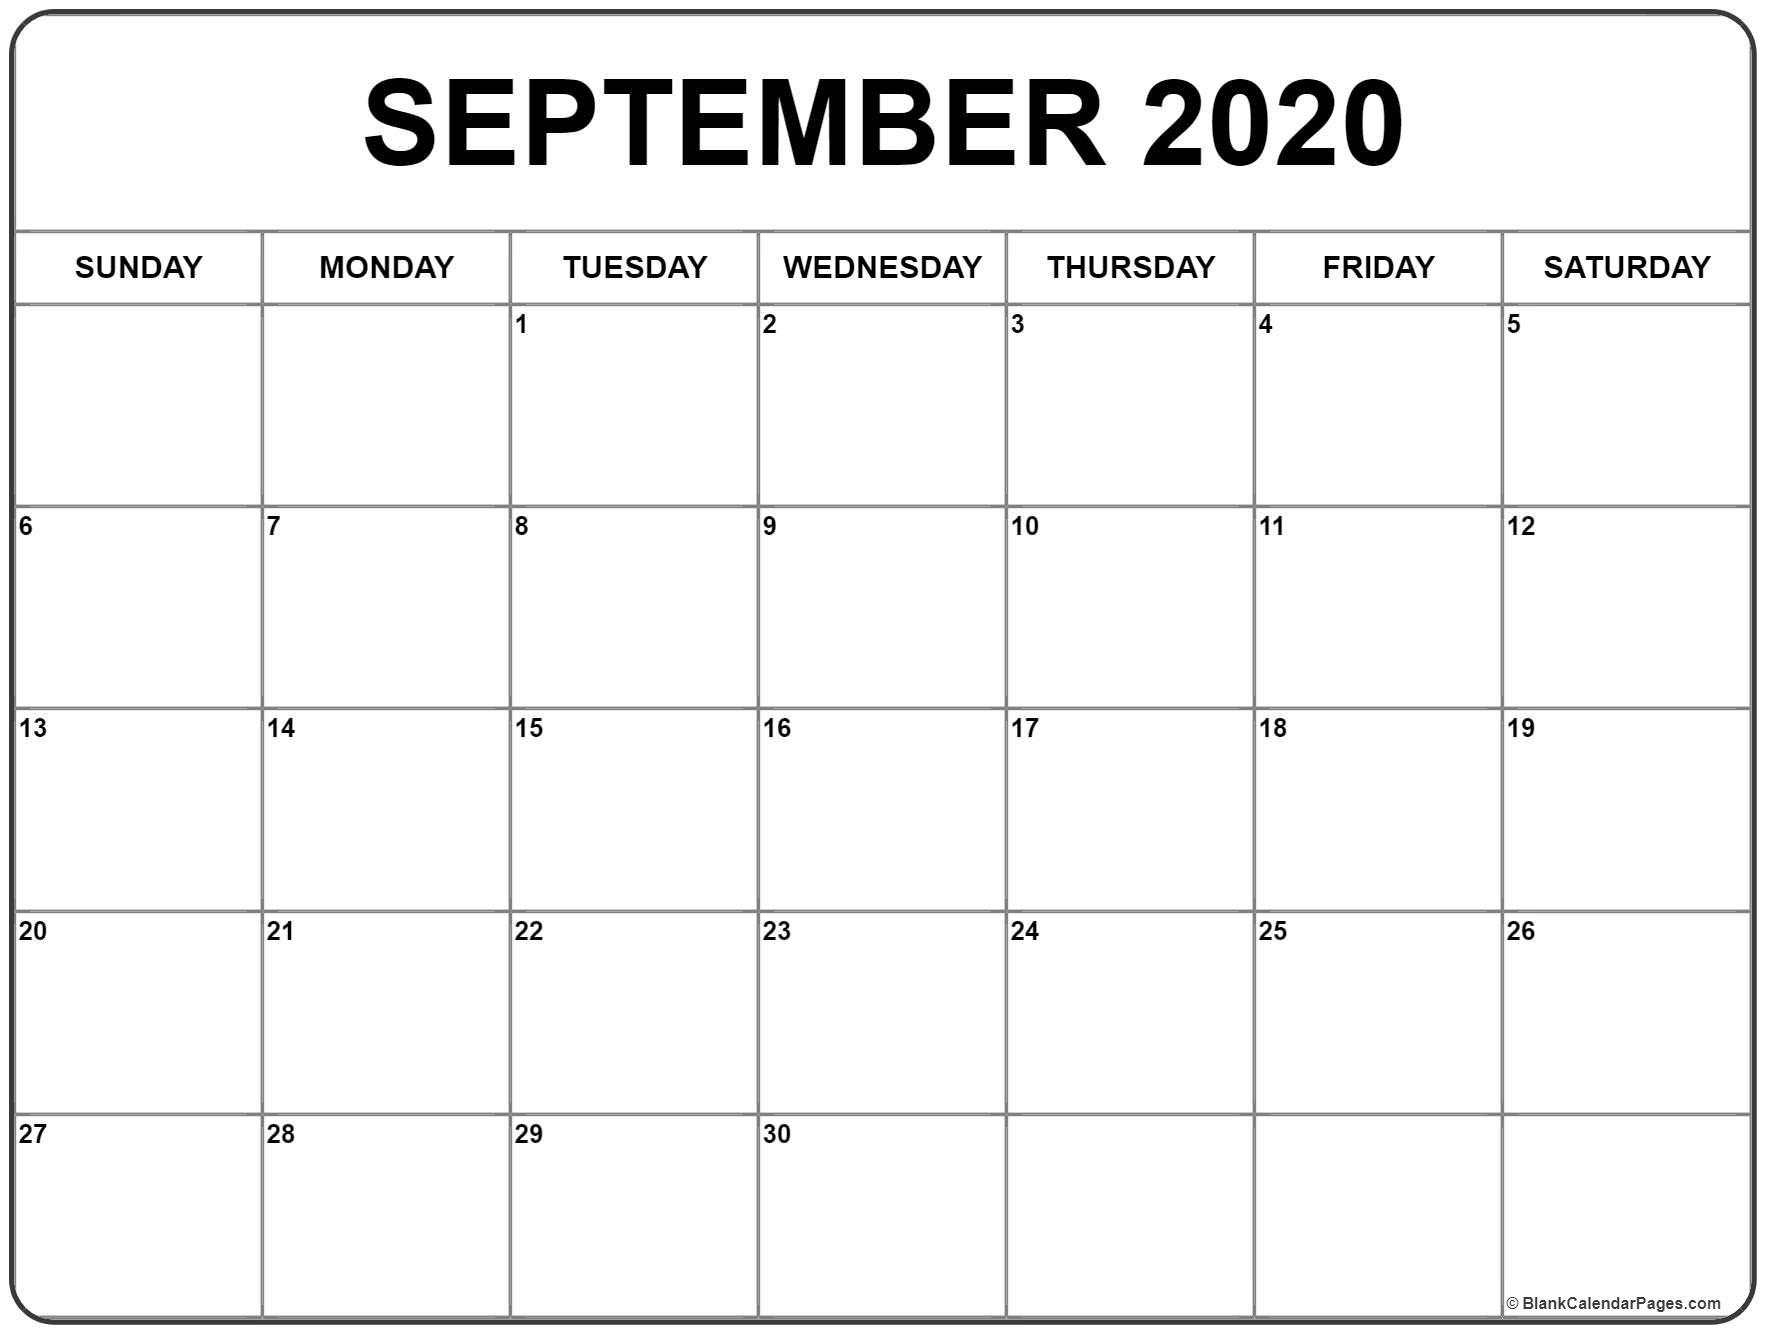 September 2020 Calendar | Free Printable Monthly Calendars pertaining to Fill In Calendar Printable